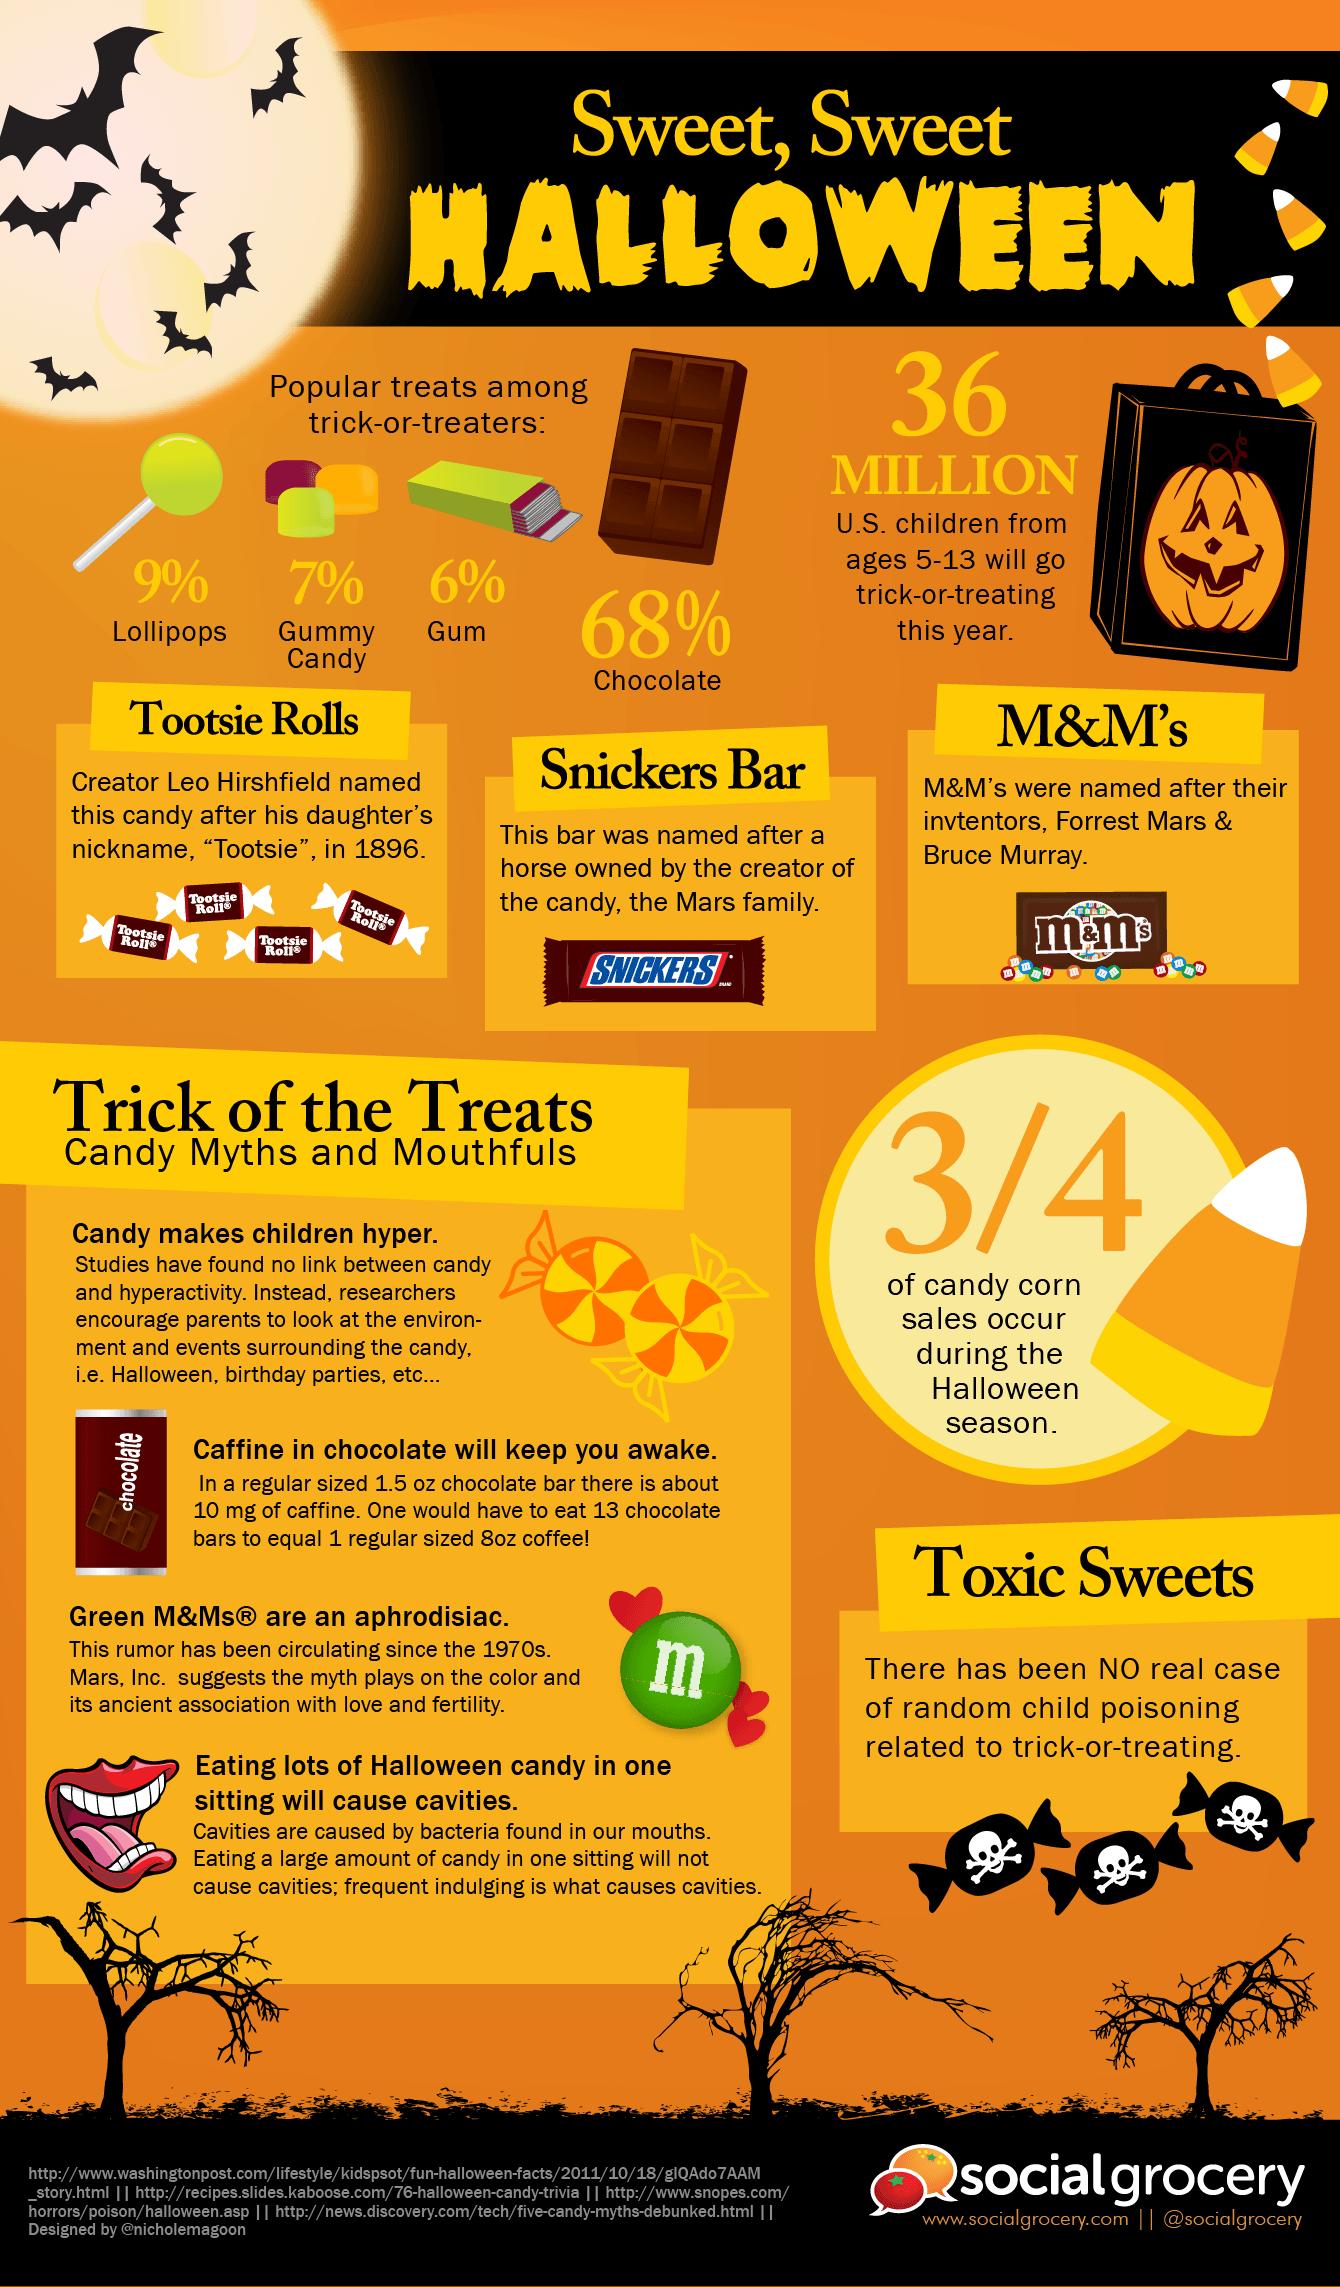 Sweet Sweet Halloween